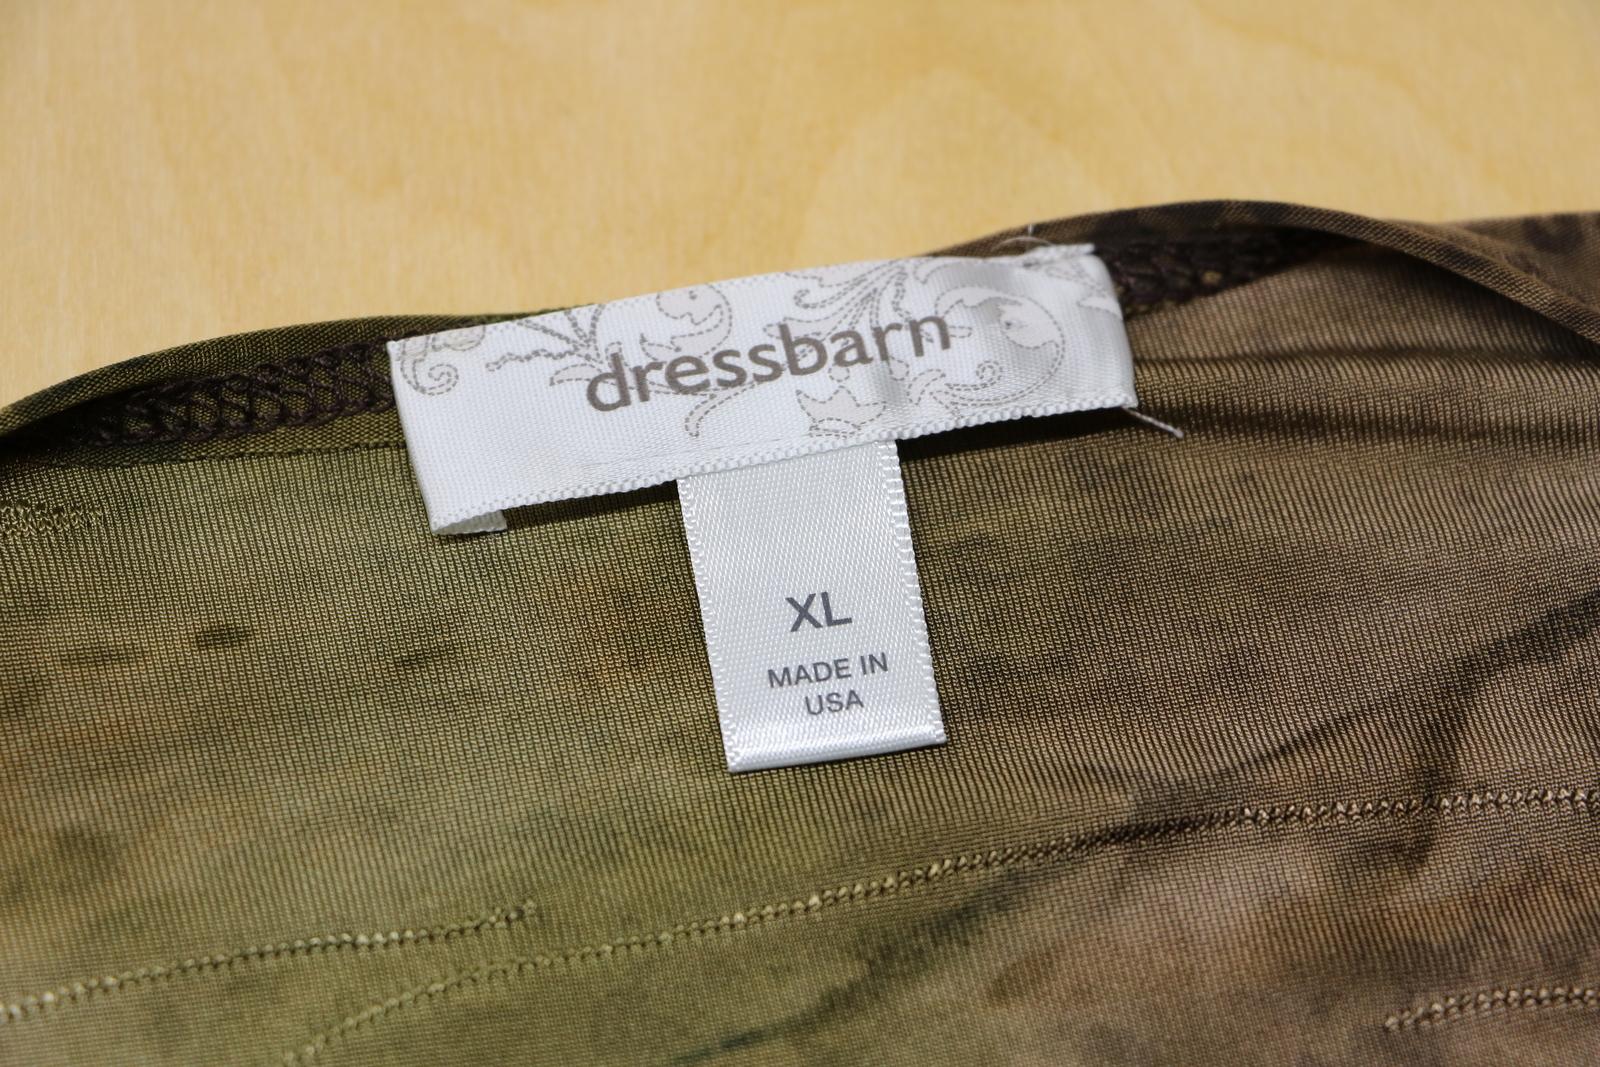 DressBarn Woman's XL Olive Green Jeweled Polyester Geometric Blouse Dress Barn